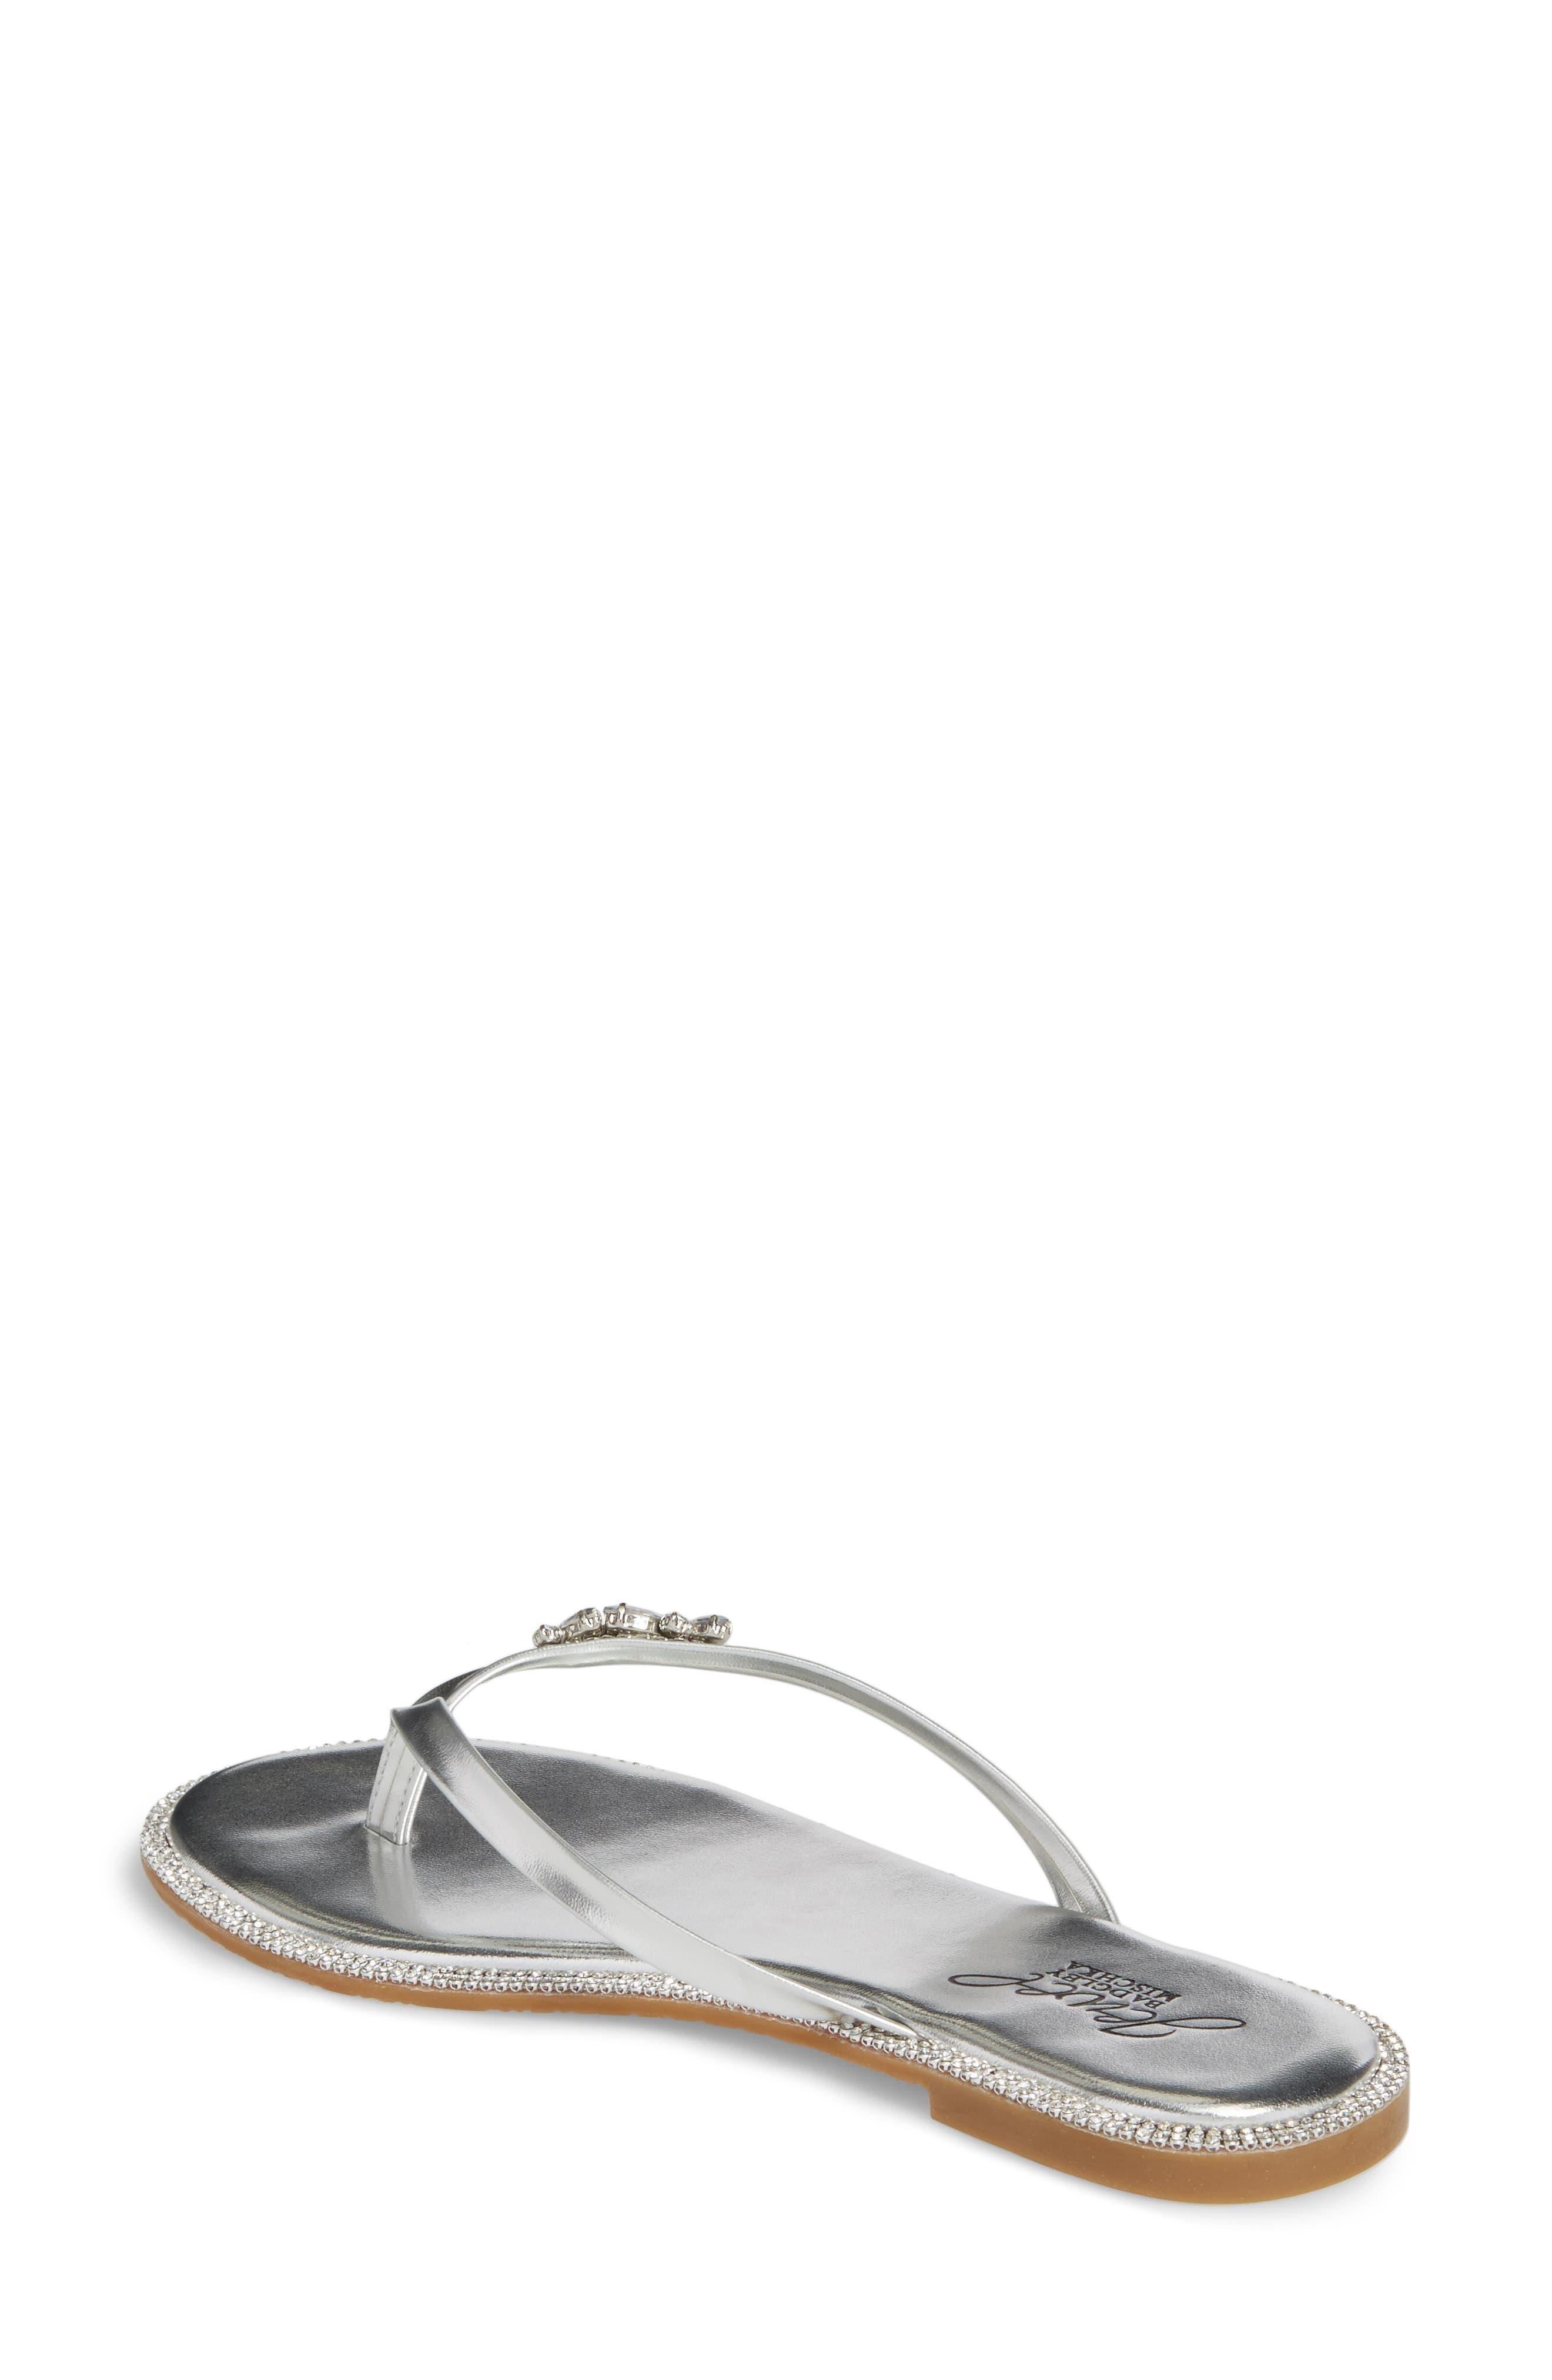 Thalia Crystal Embellished Flip Flop,                             Alternate thumbnail 2, color,                             Silver Leather